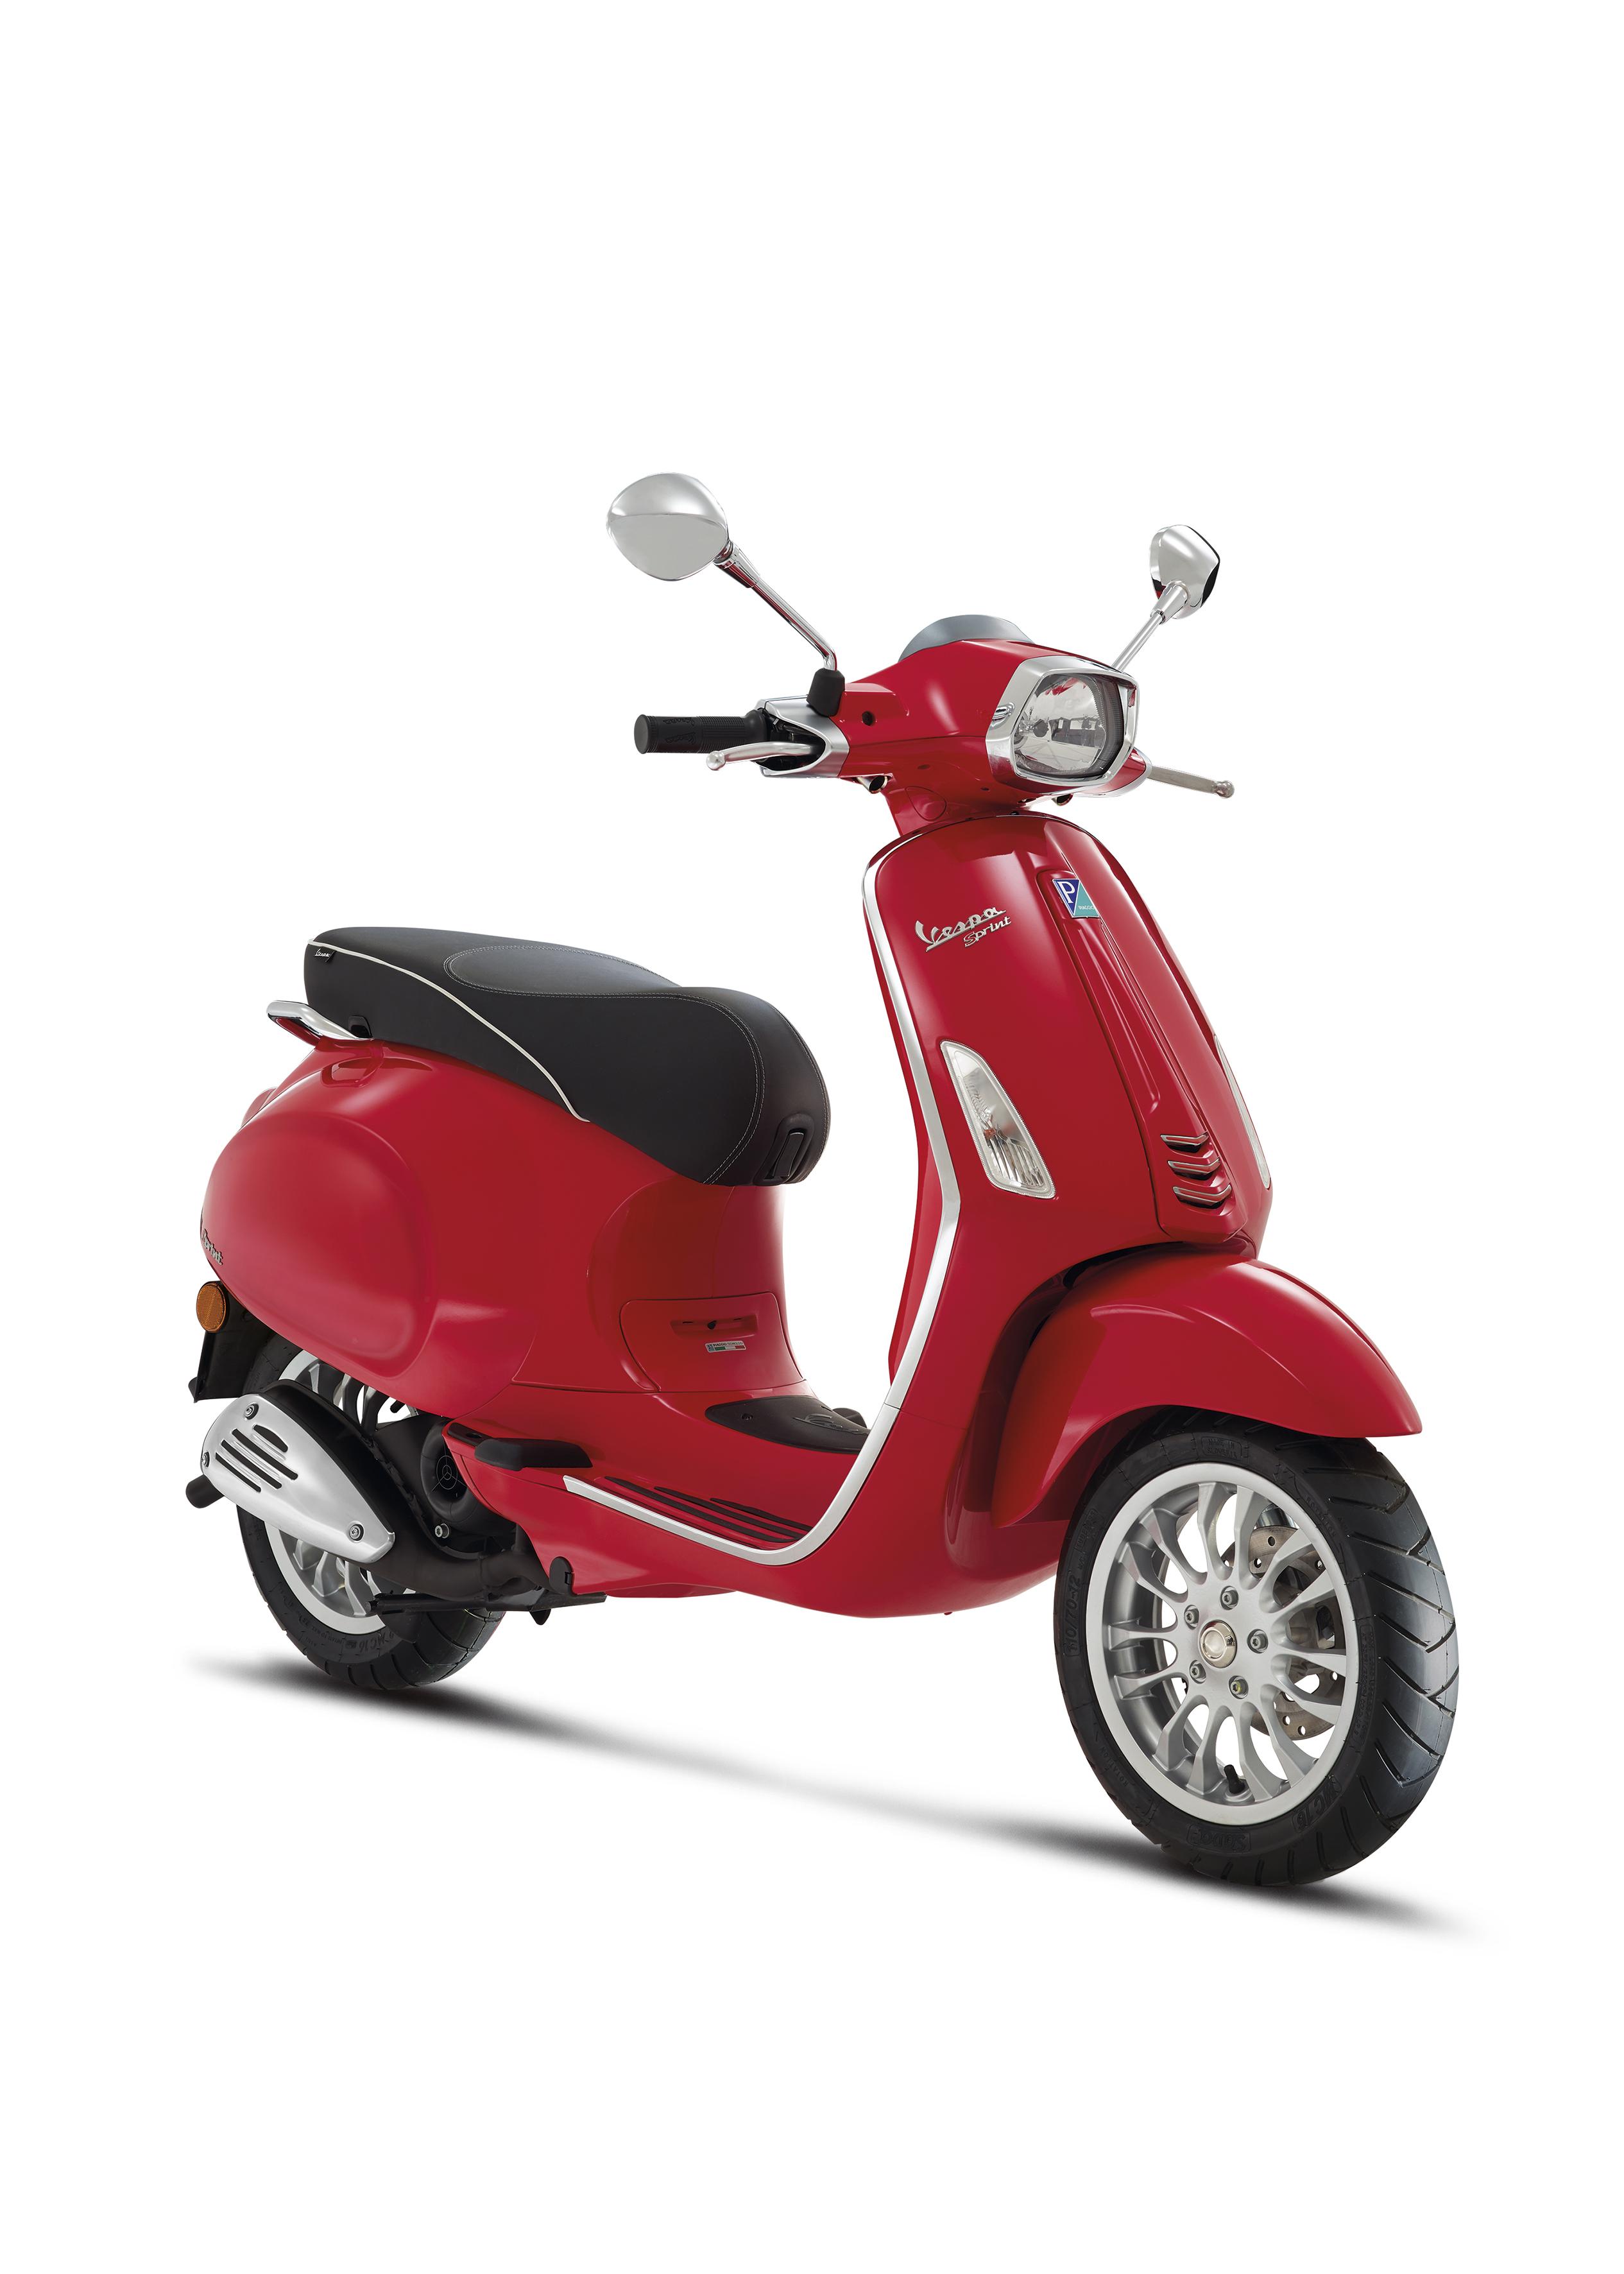 2019 Vespa Elettrica X Guide • Total Motorcycle